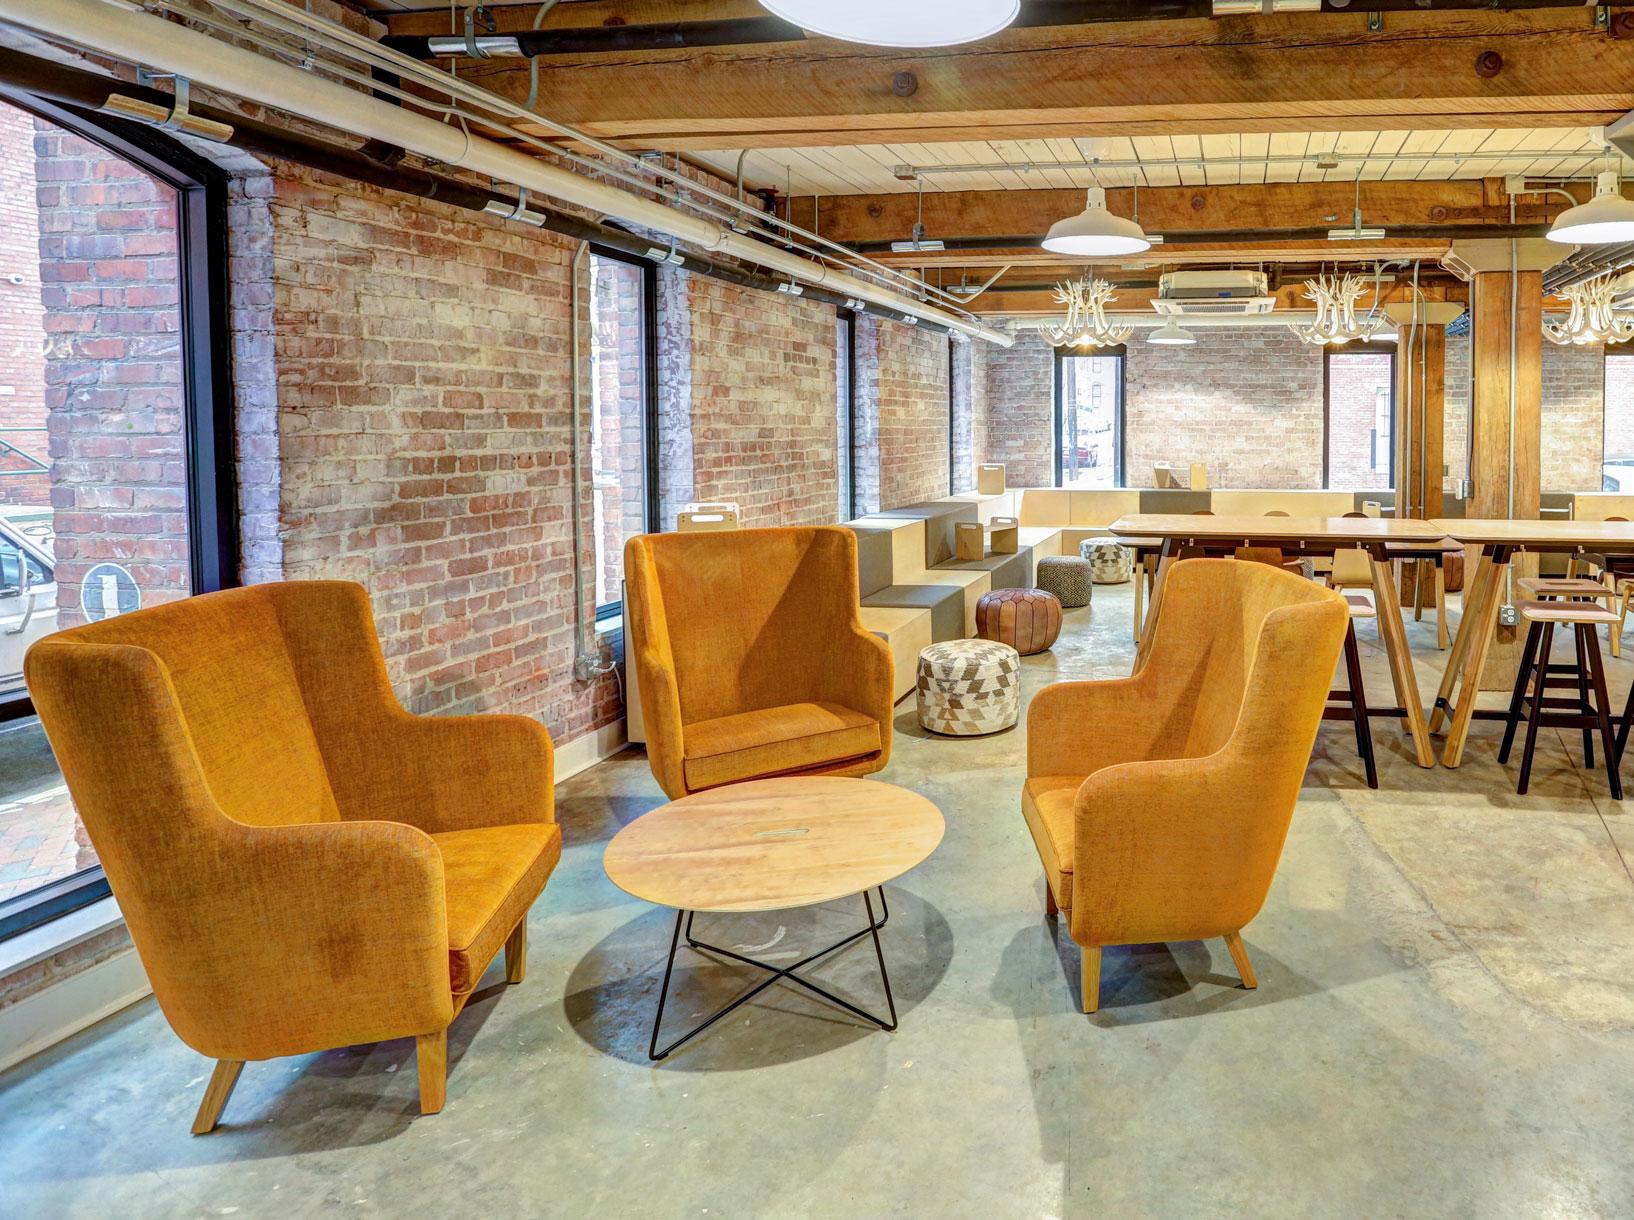 EVERGIB_Startup-Virginia_Interior_Chairs_B